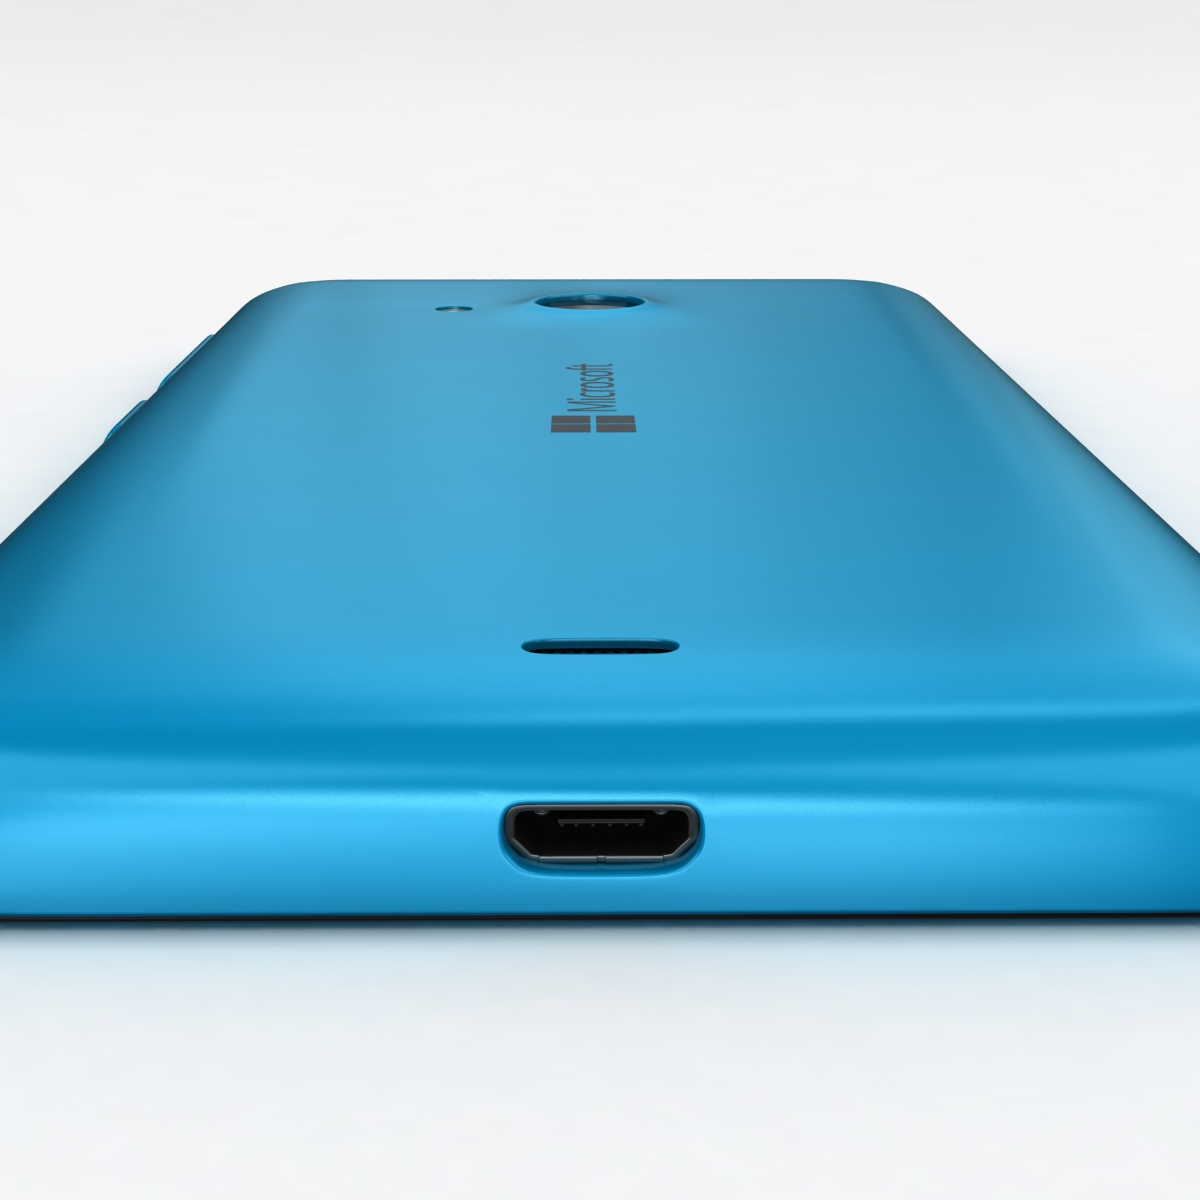 microsoft lumia 535 and dual sim blue 3d model 3ds max fbx c4d obj 204529